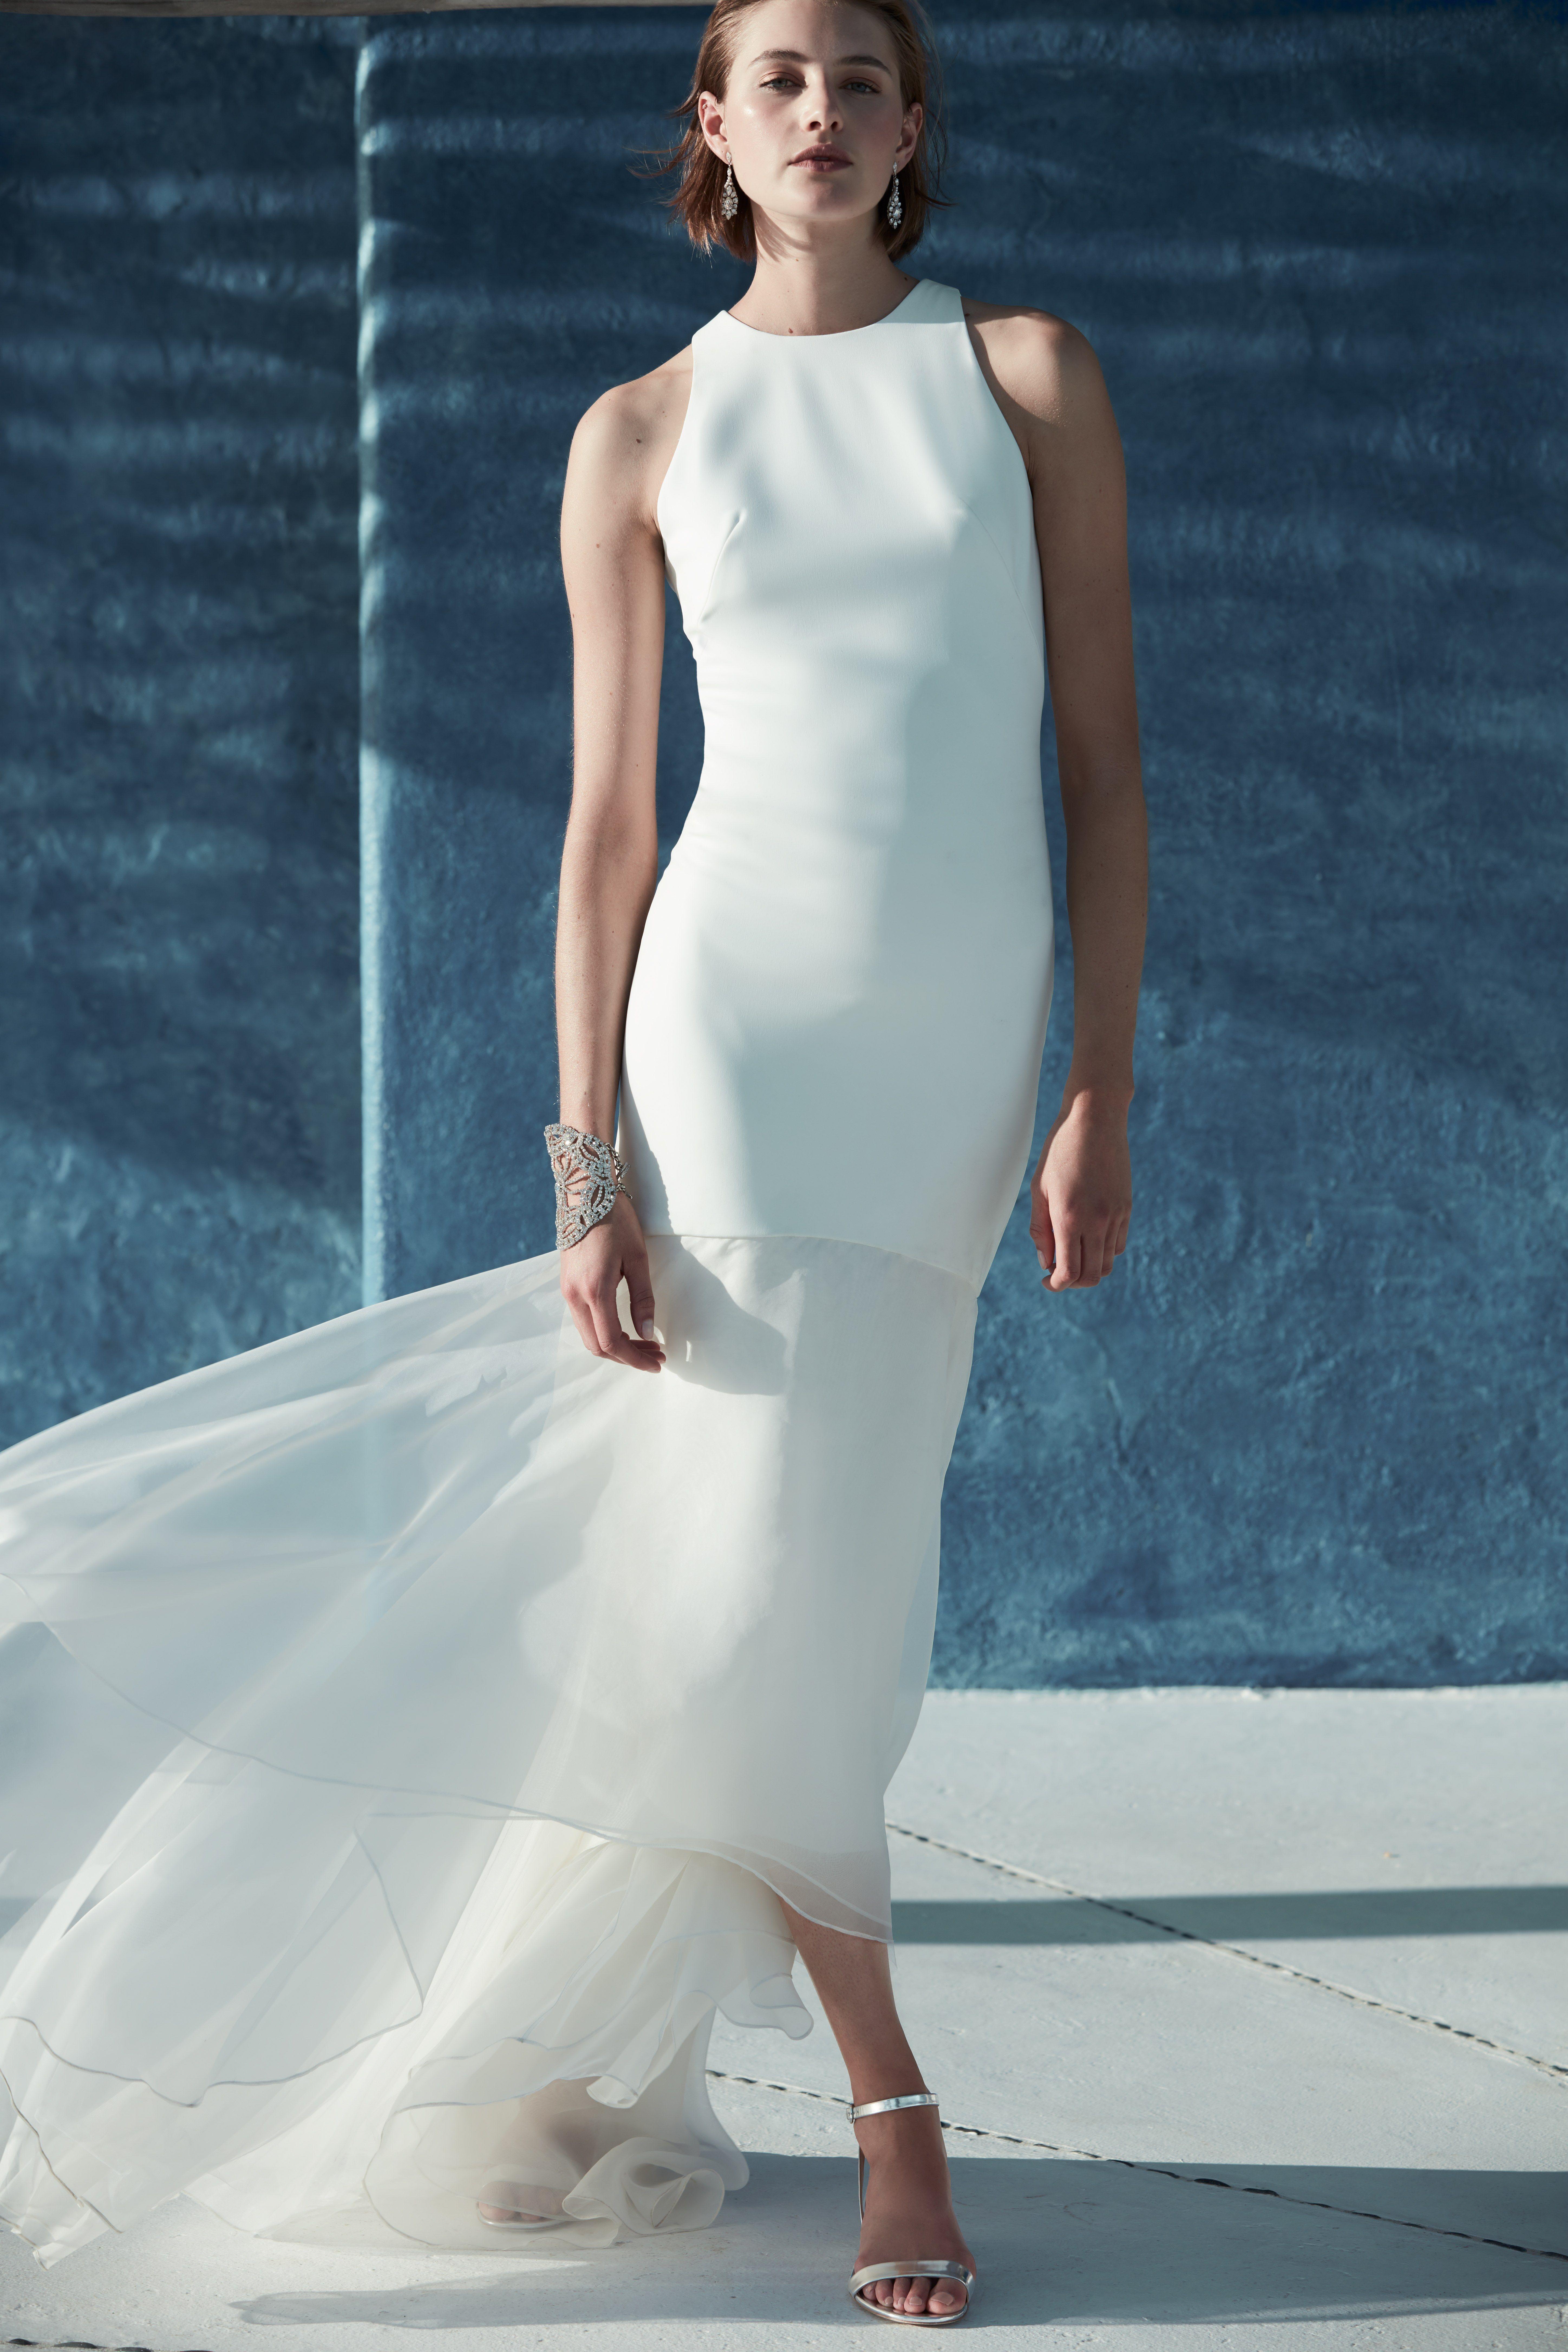 Simple Wedding Dress Casual - The Best Wedding 2018